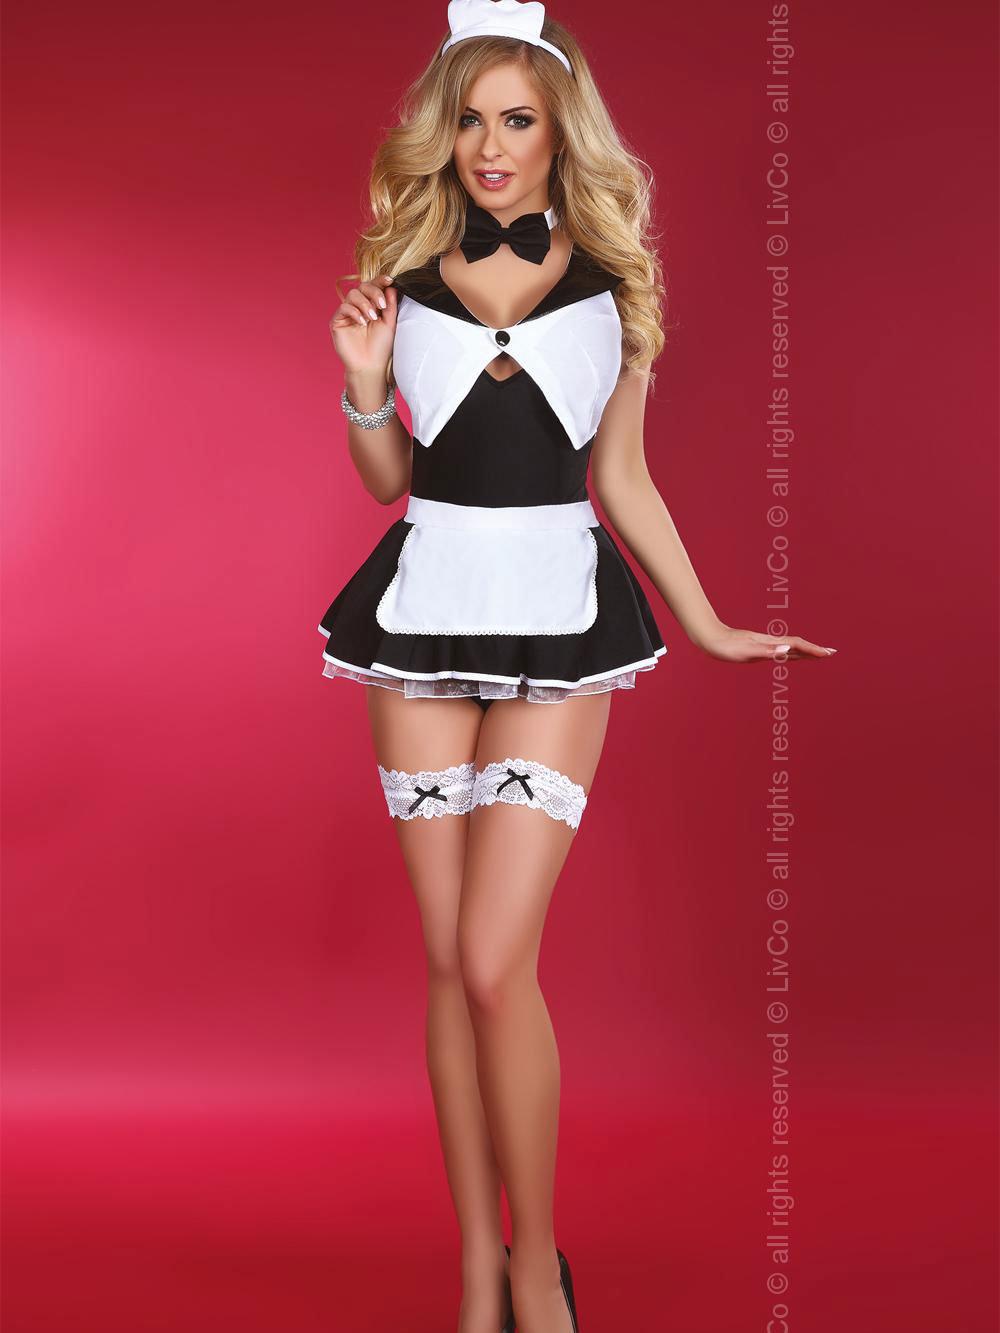 LivCo Costum Flirty Maid